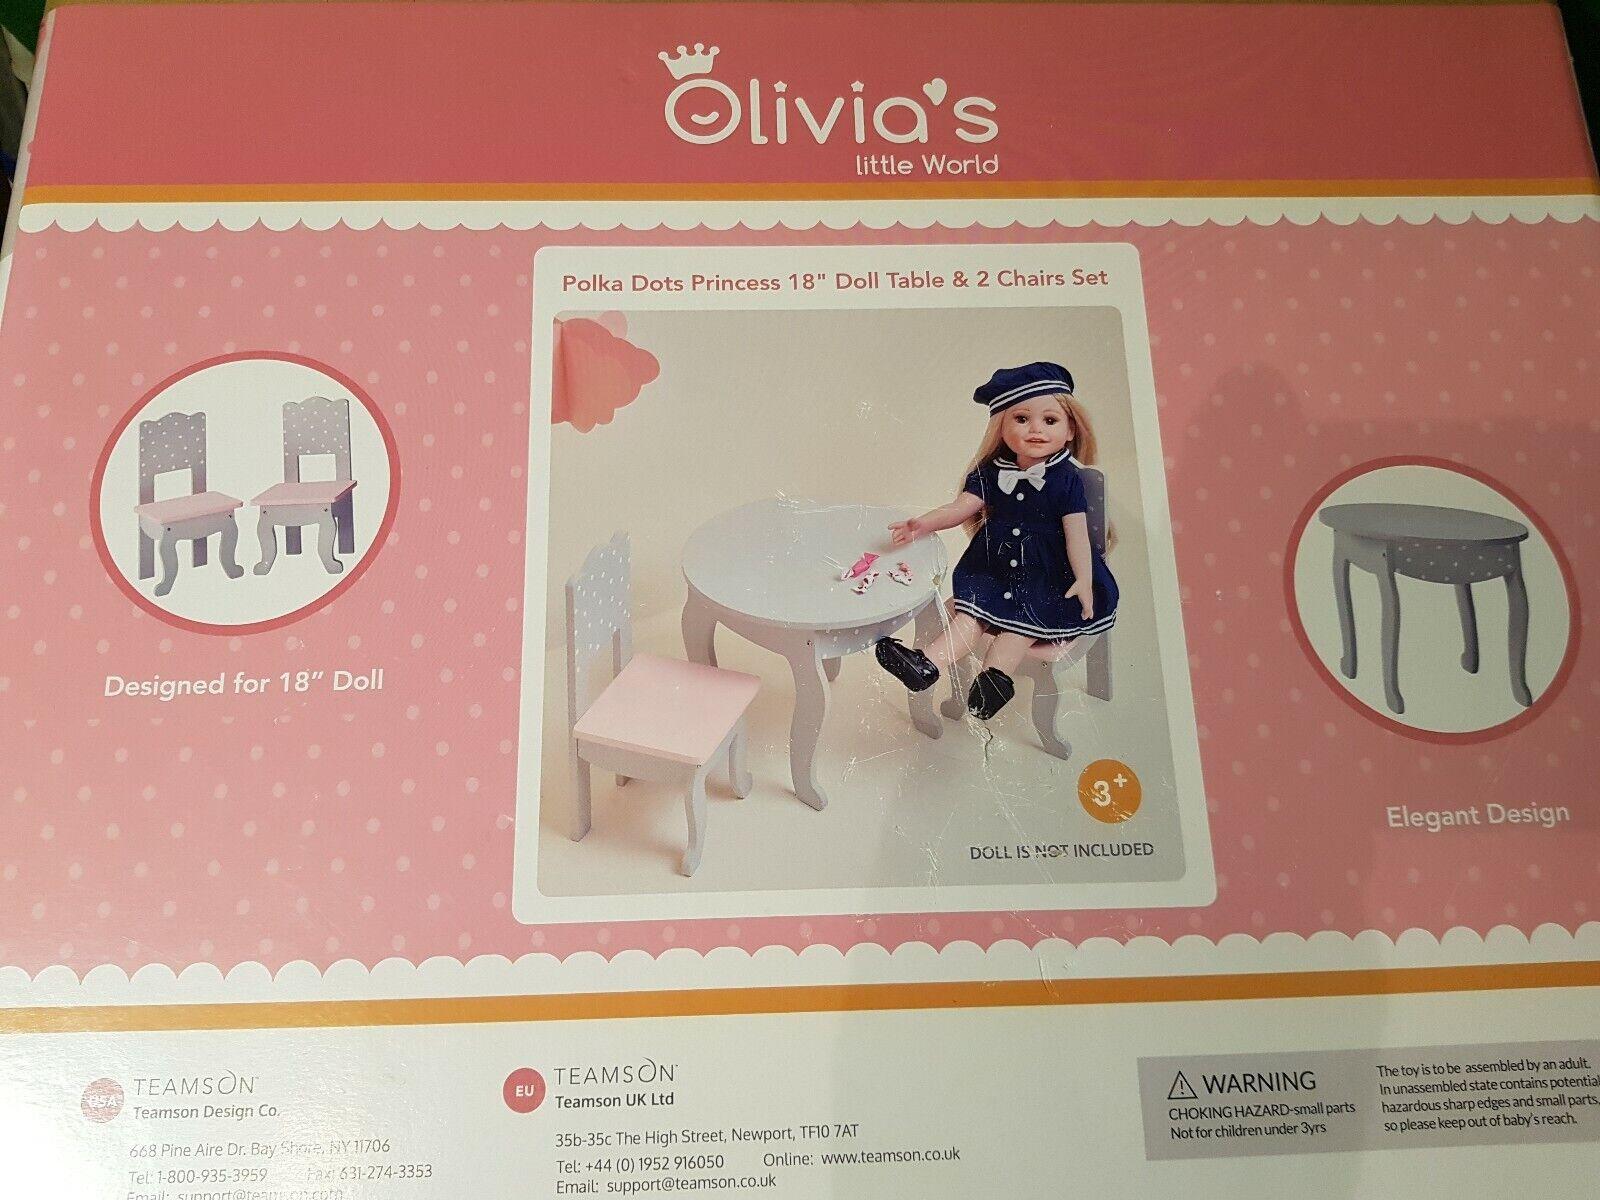 autentico online OLIVIAS World 18    bambino bambola mobili in legno Indoor Tavolo Sedie Set a Pois  best-seller